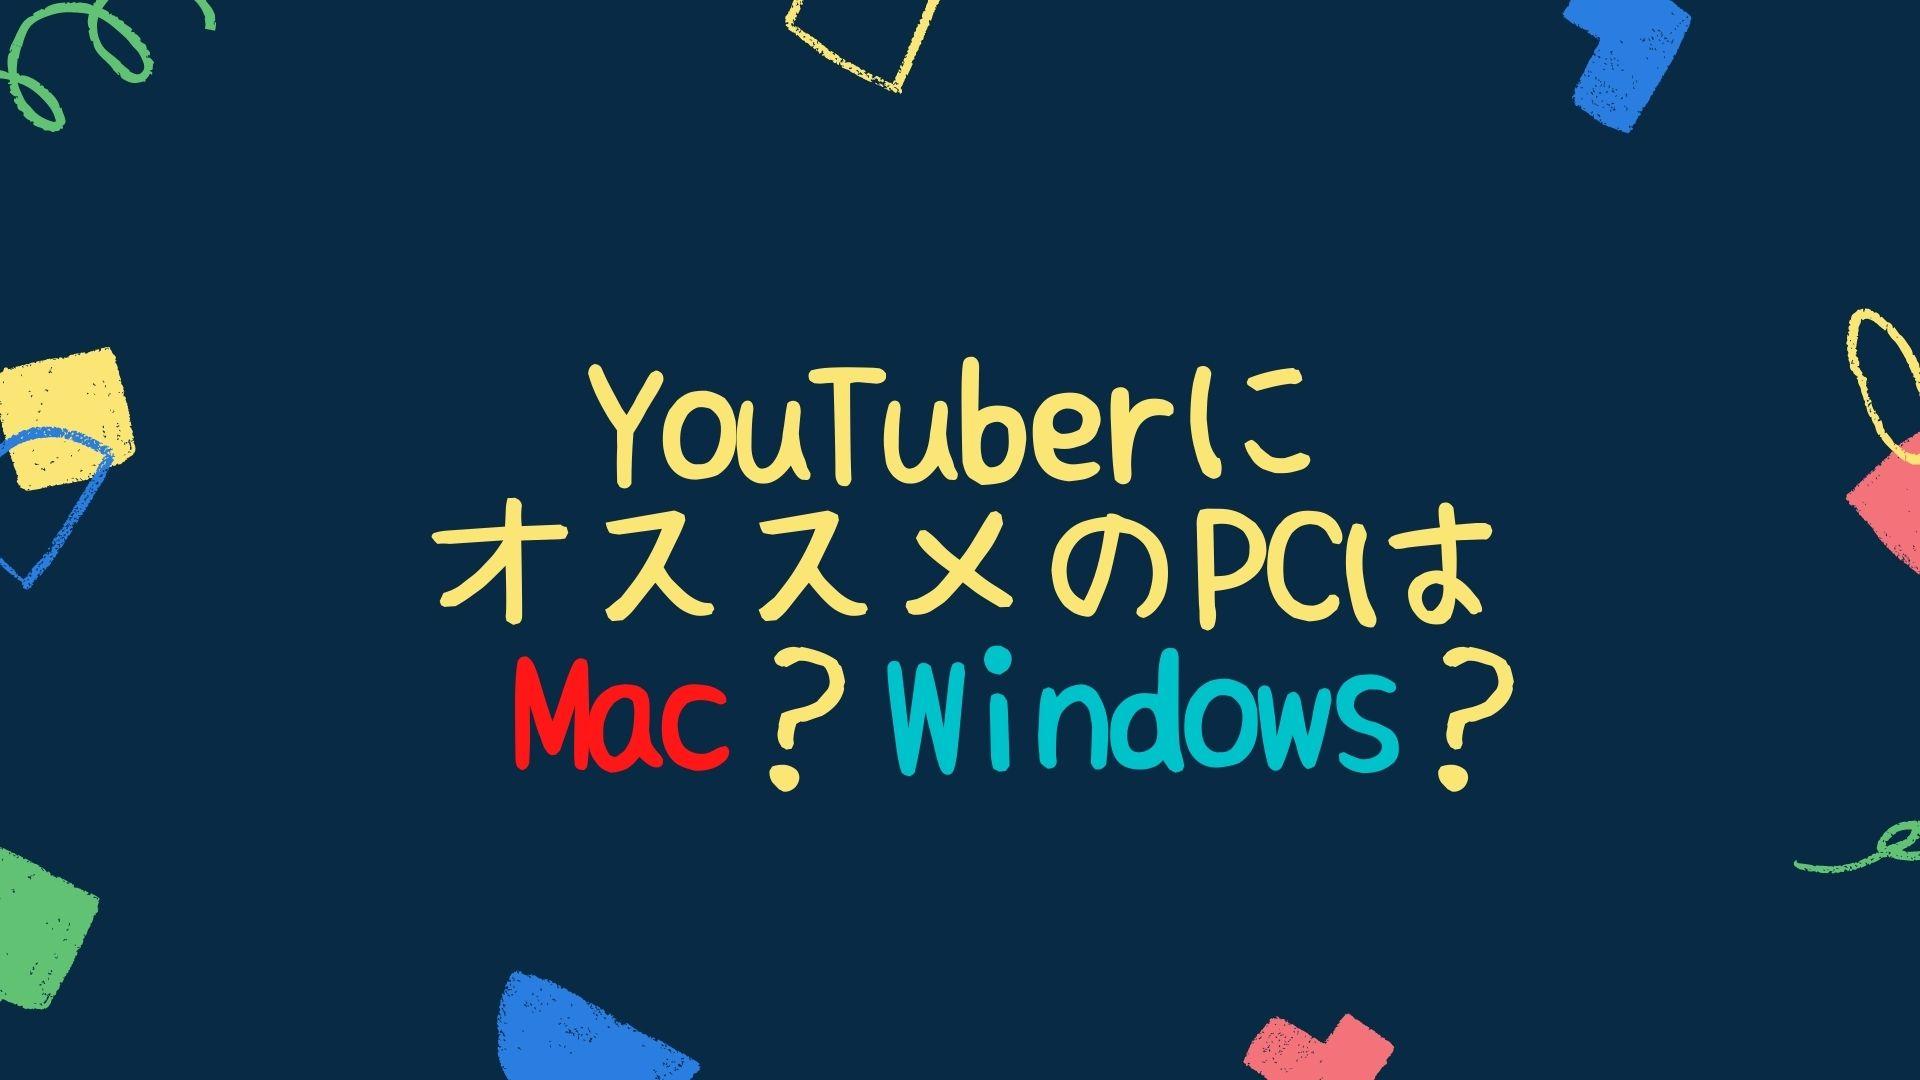 YouTuberにオススメのPCはMac?Windows?